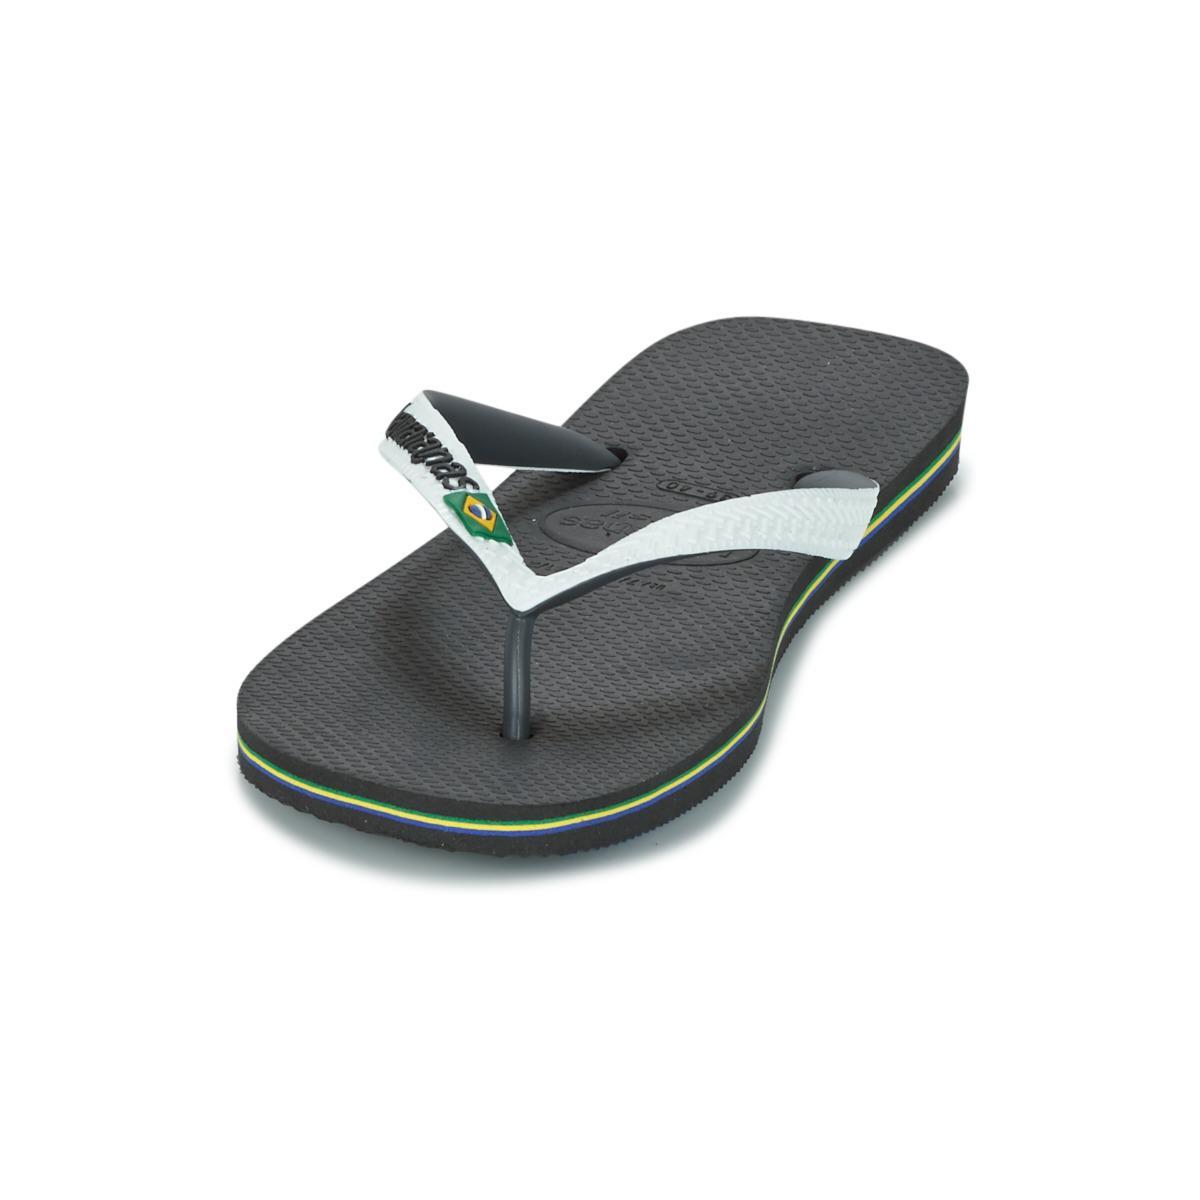 53ebcdf43acdb Havaianas Brasil Mix Flip Flops   Sandals (shoes) in White - Save ...